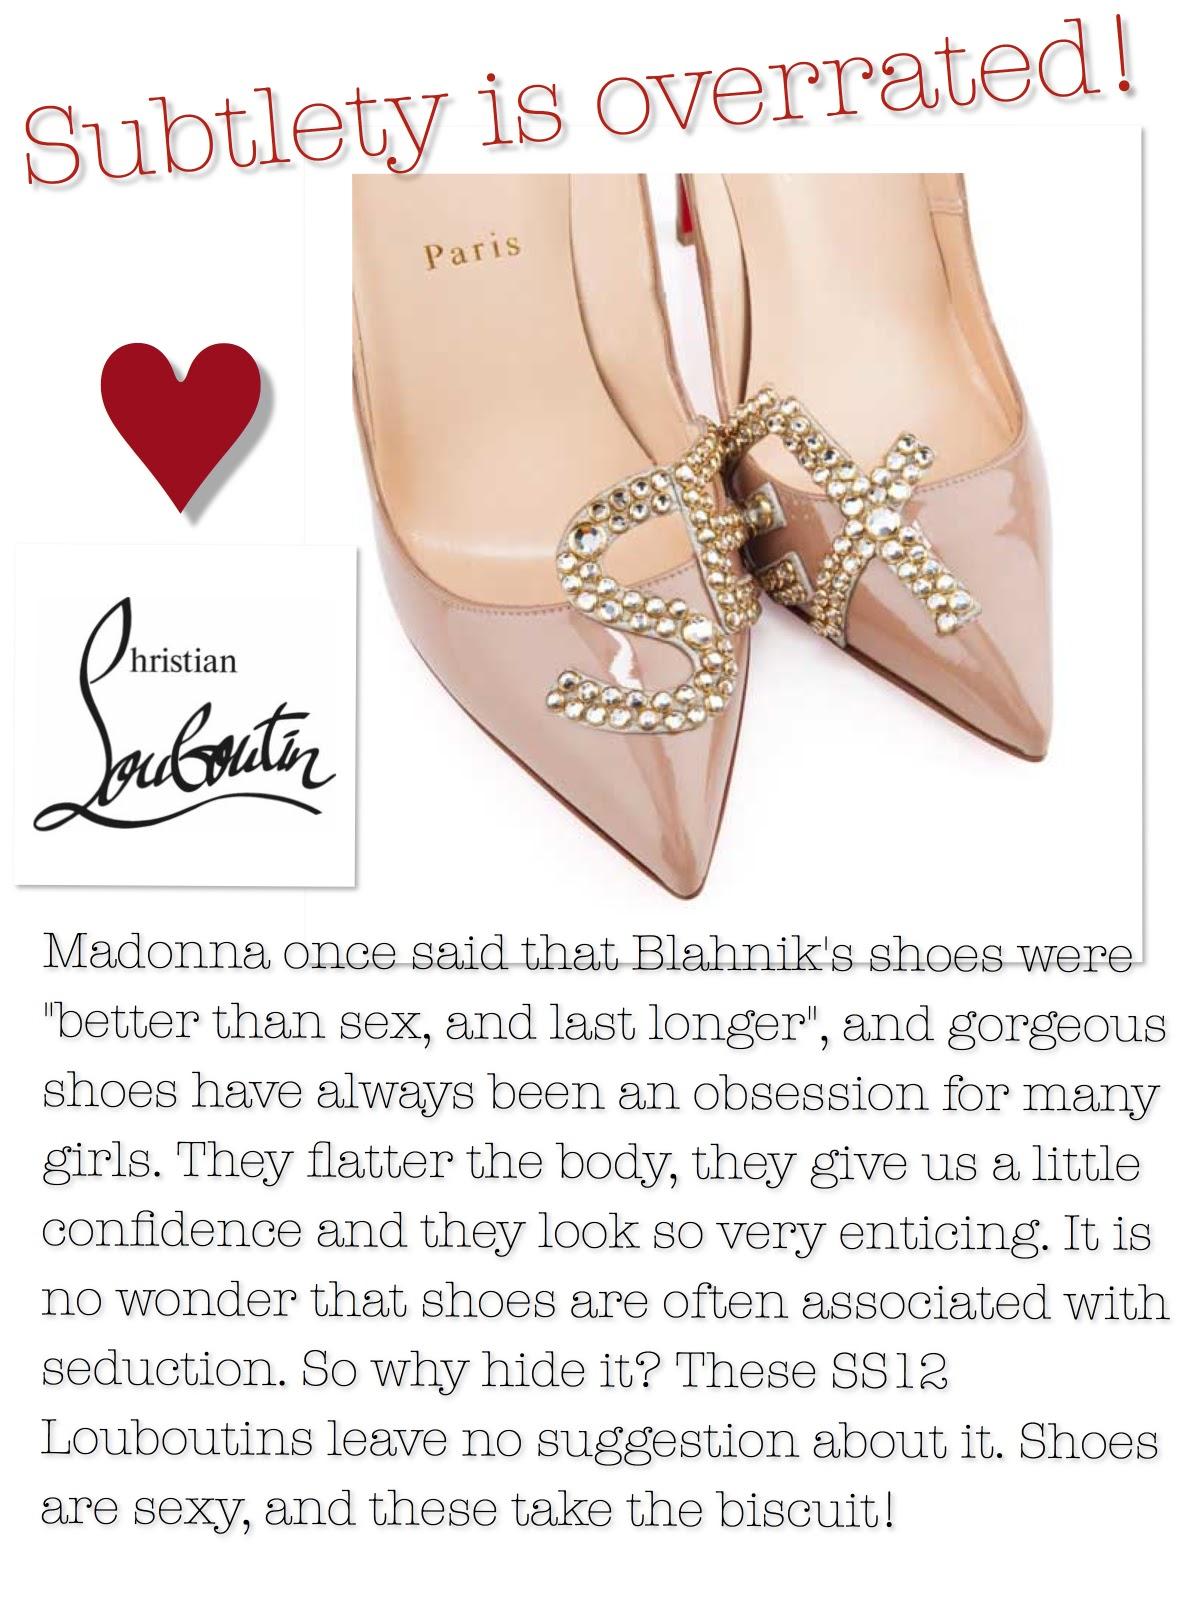 http://1.bp.blogspot.com/-yH_HXCC6sKU/TyXMrcn8KUI/AAAAAAAACx0/dhjtq-CYthw/s1600/louboutin+sex+shoes+yummy.jpg